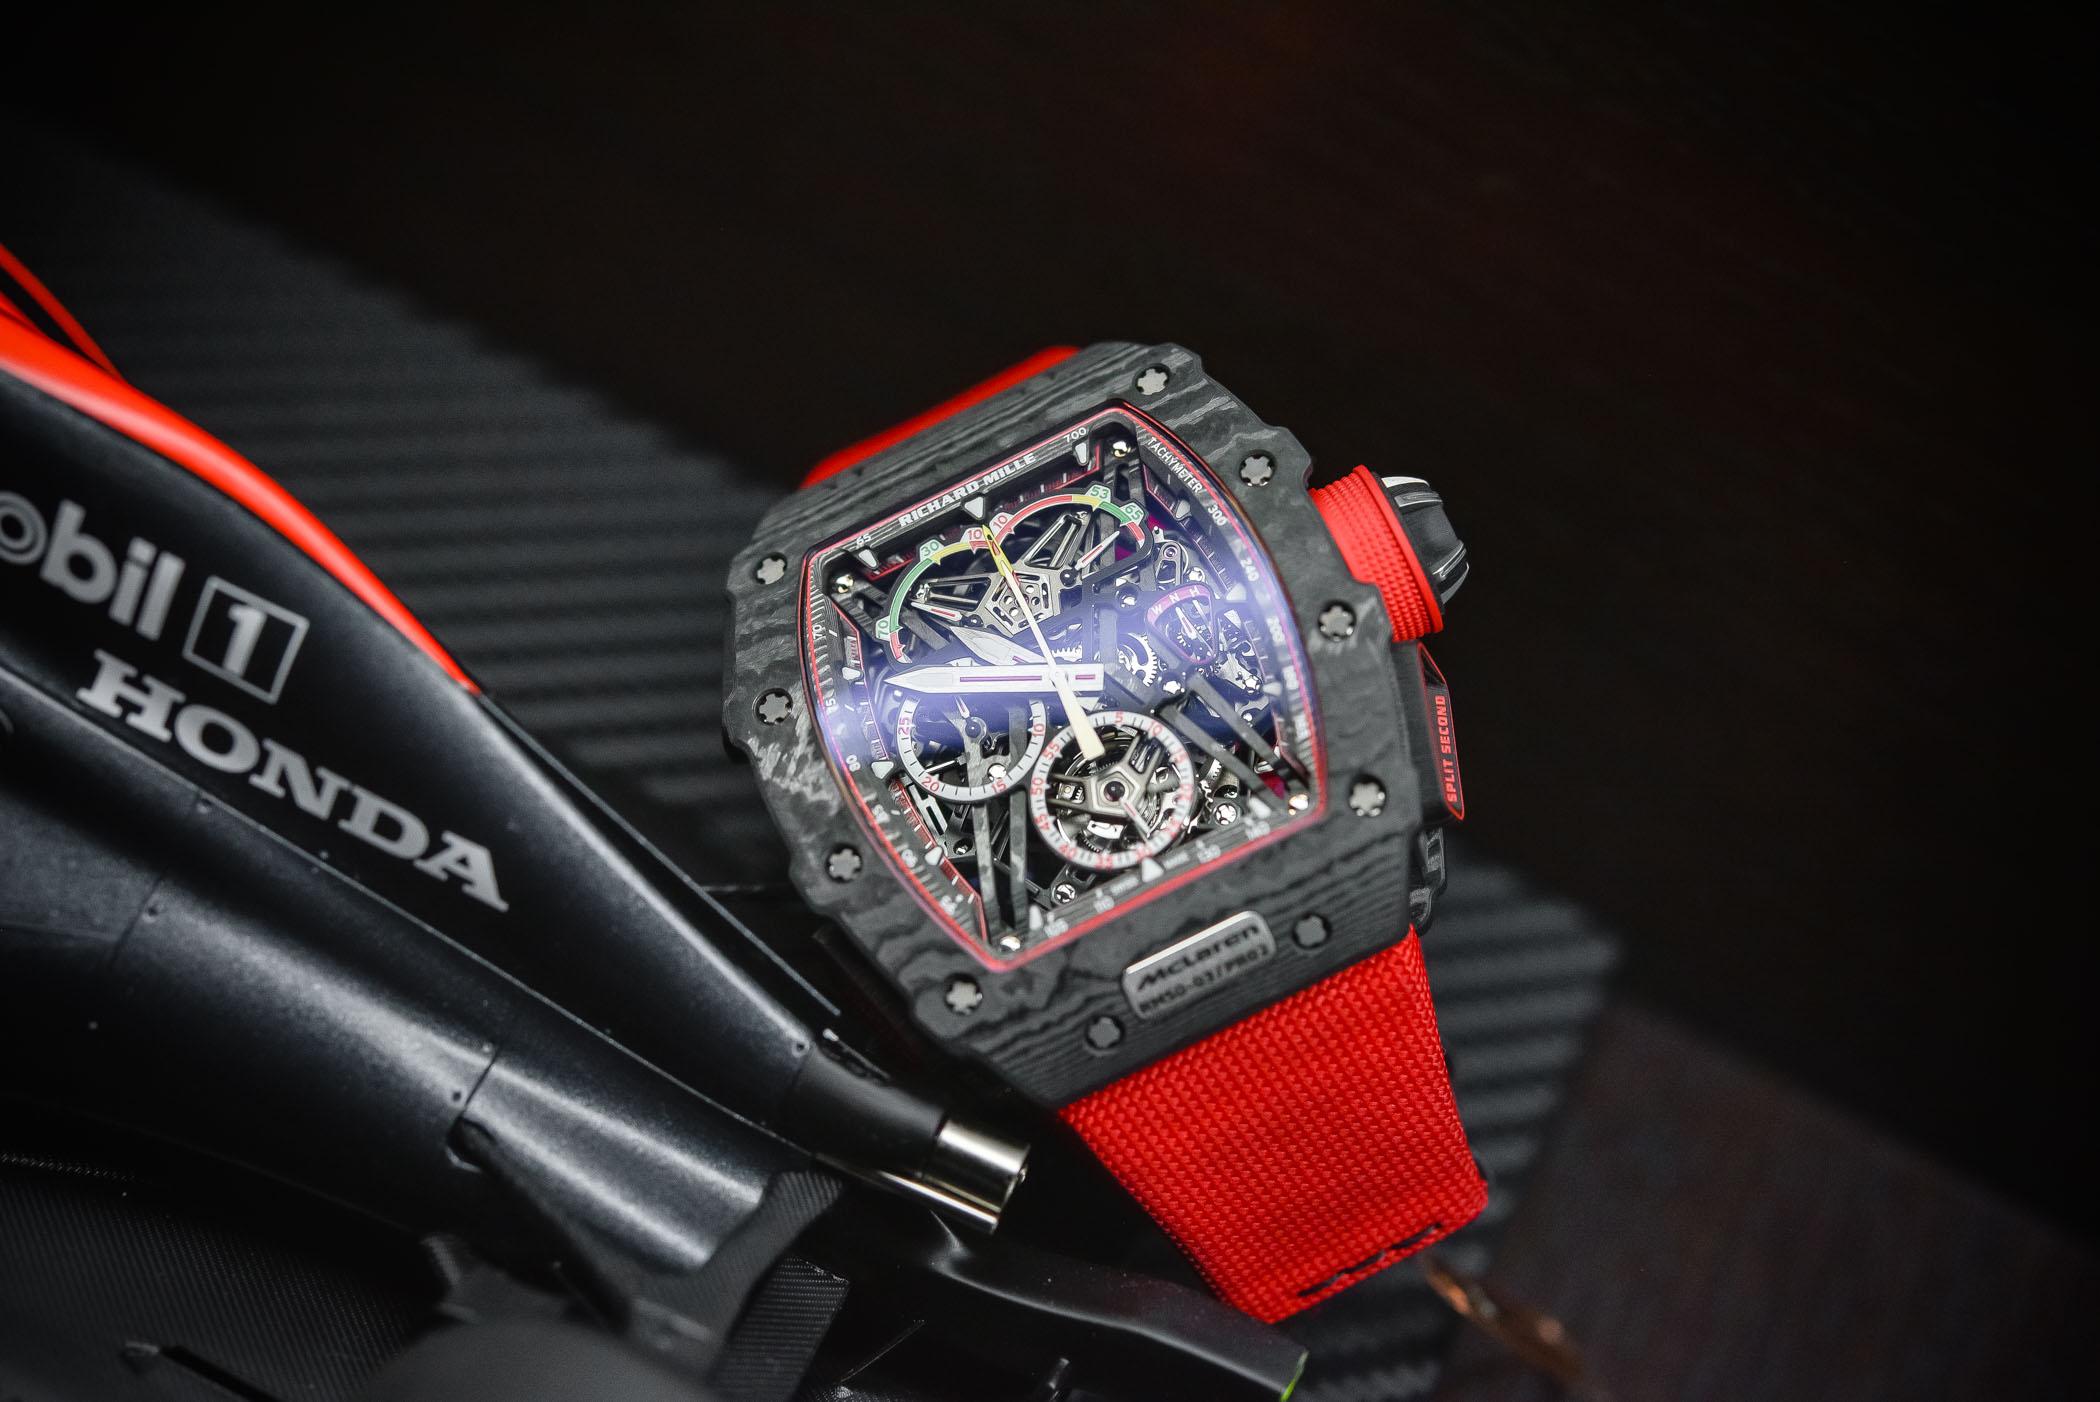 Watches and Formula 1 - Episode 6 - McLaren & Richard Mille